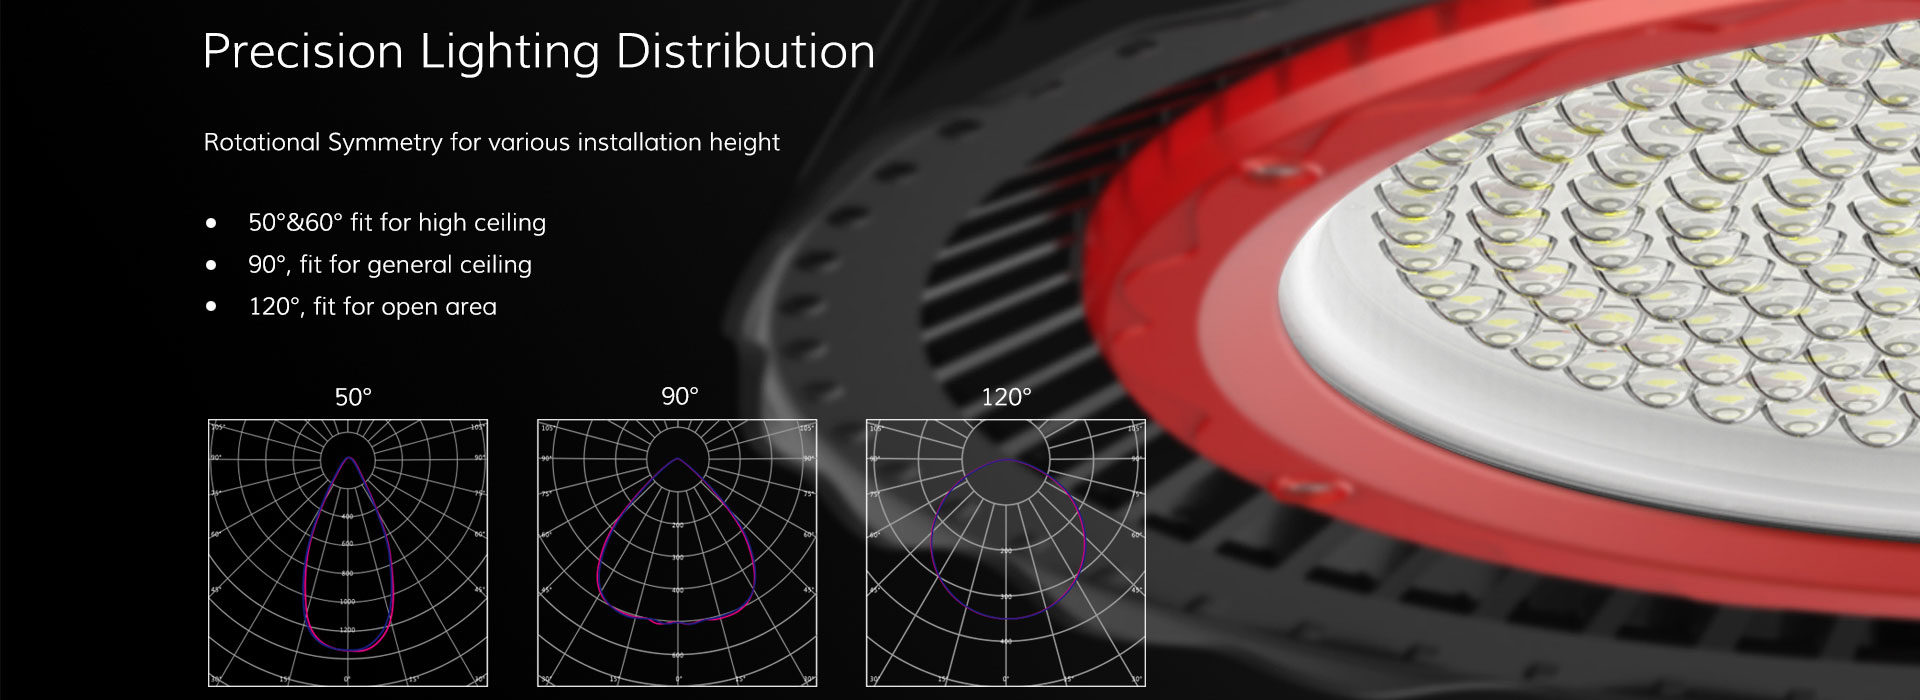 HiCloud-Precision-Lighting-Distribution